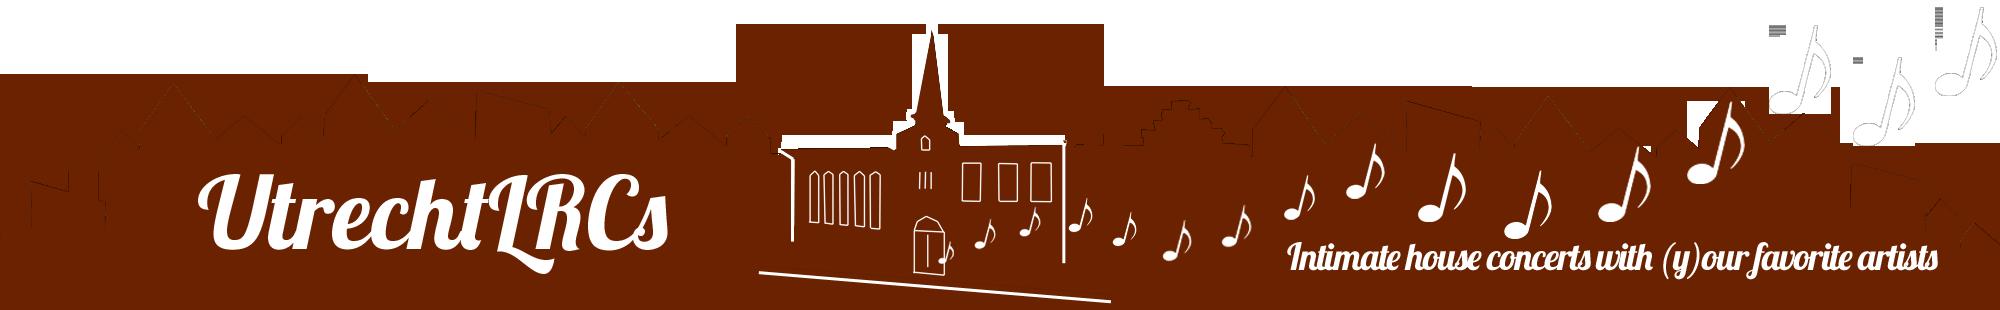 UtrechtLRCs House Concerts